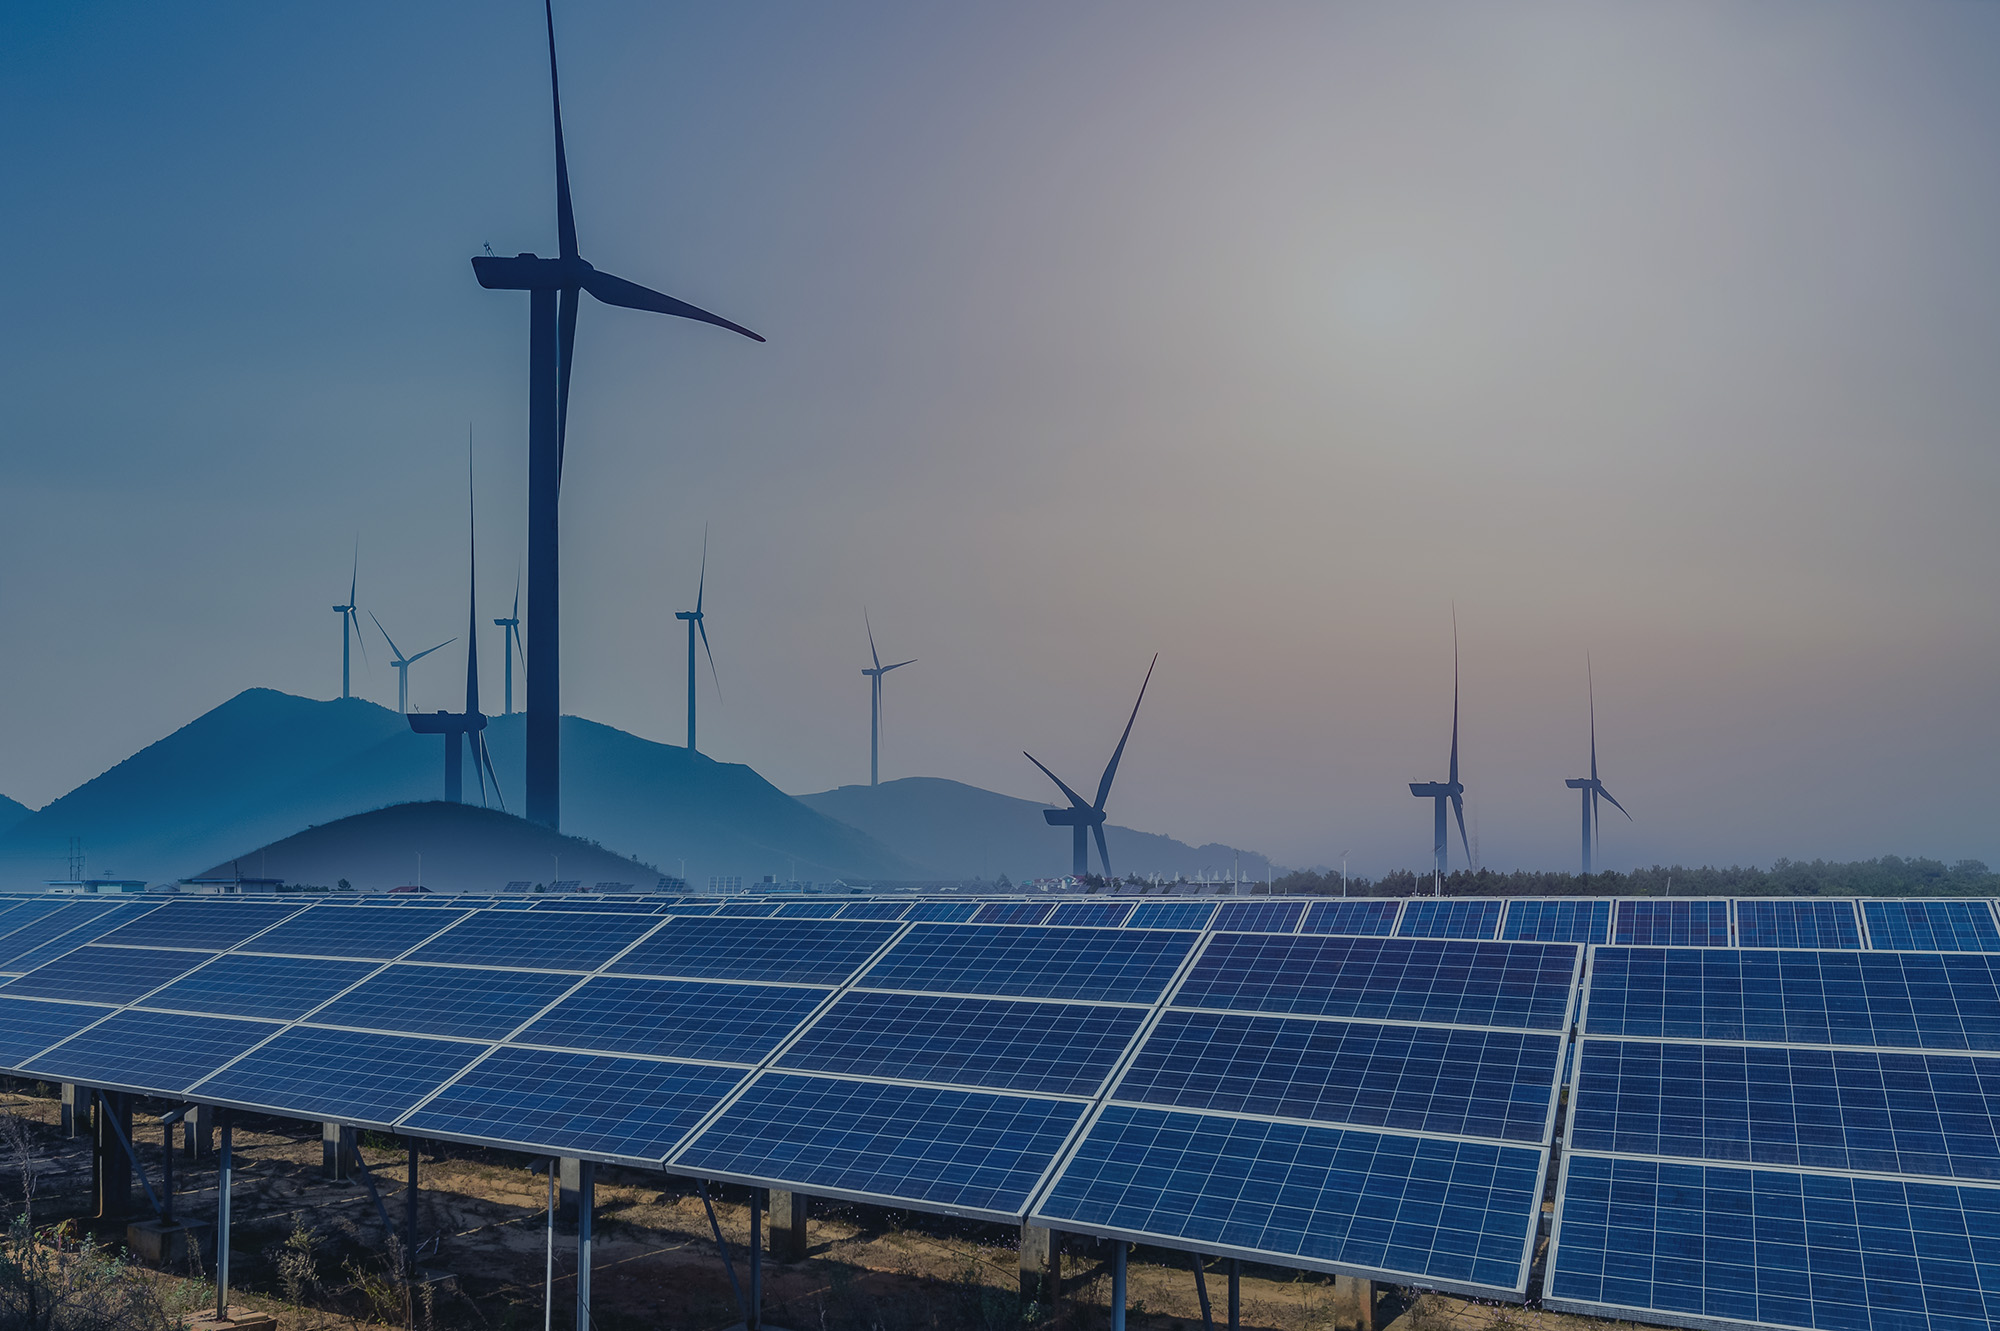 energiewerke bayern